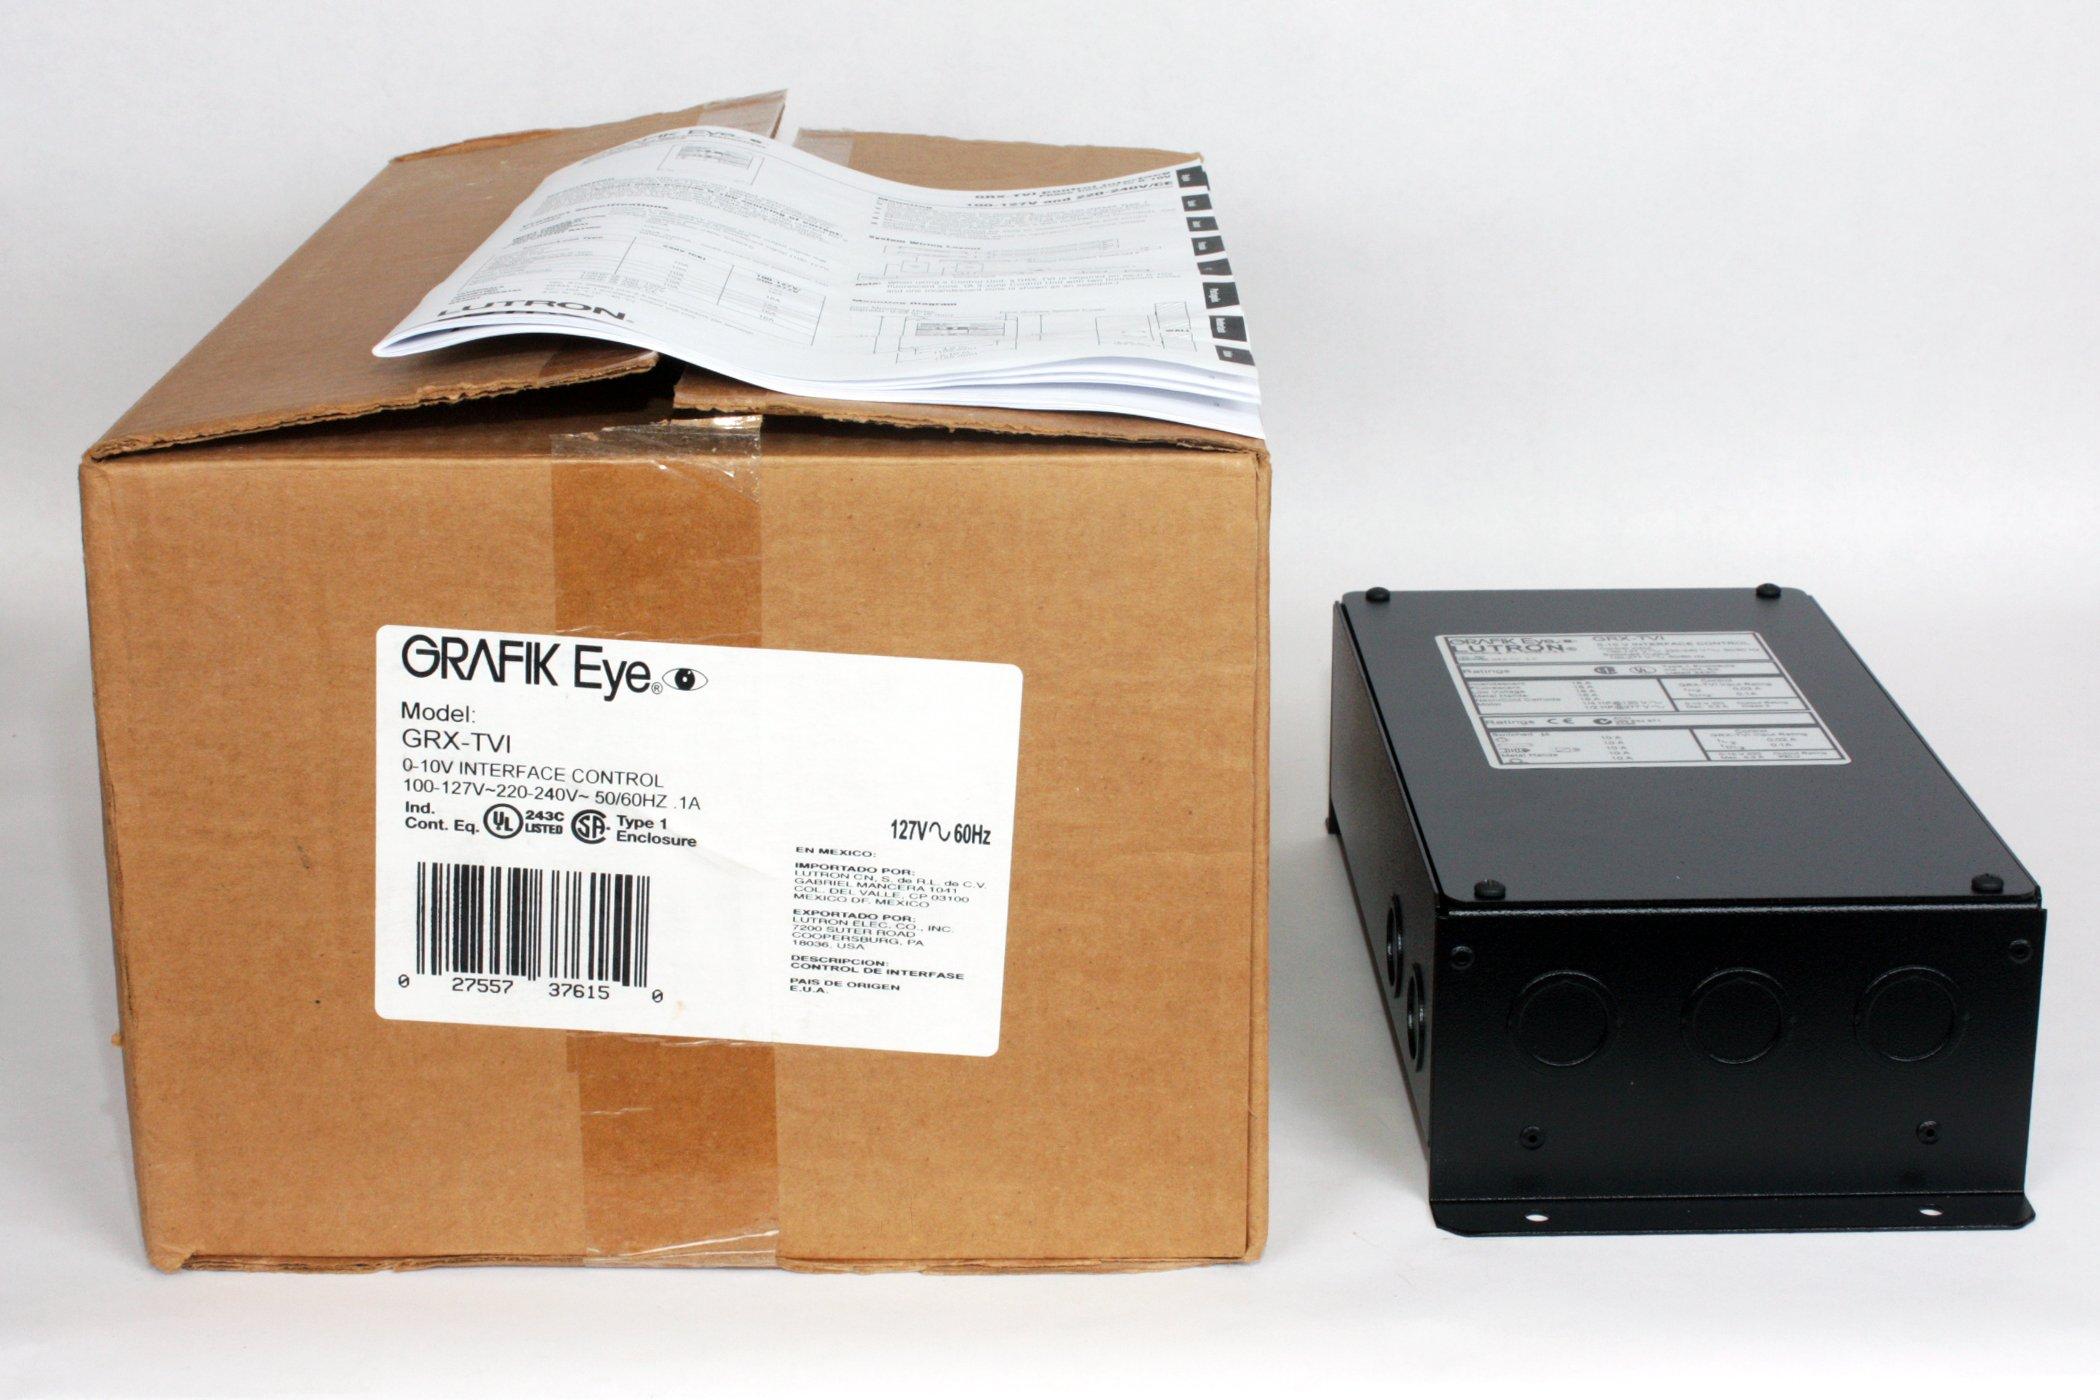 Lutron GRX-TVI Wallmount 10 Volt Power Interface and Switch Module 100 - 277 Volt Ivory